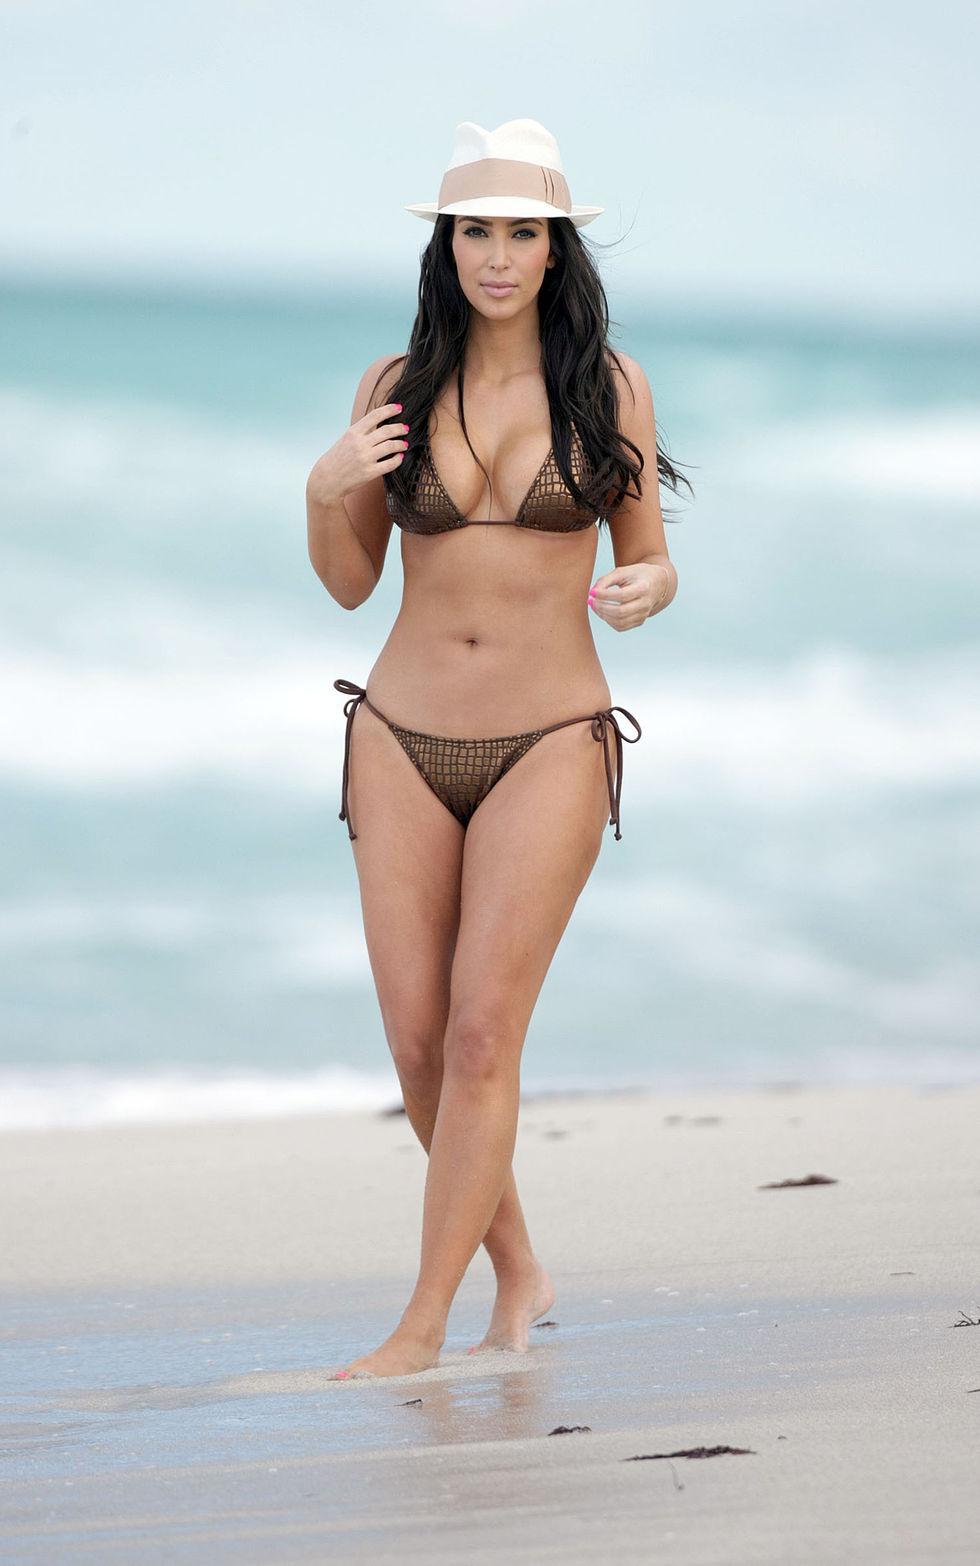 kim-kardashian-bikini-candids-at-the-beach-in-miami-hq-2-06